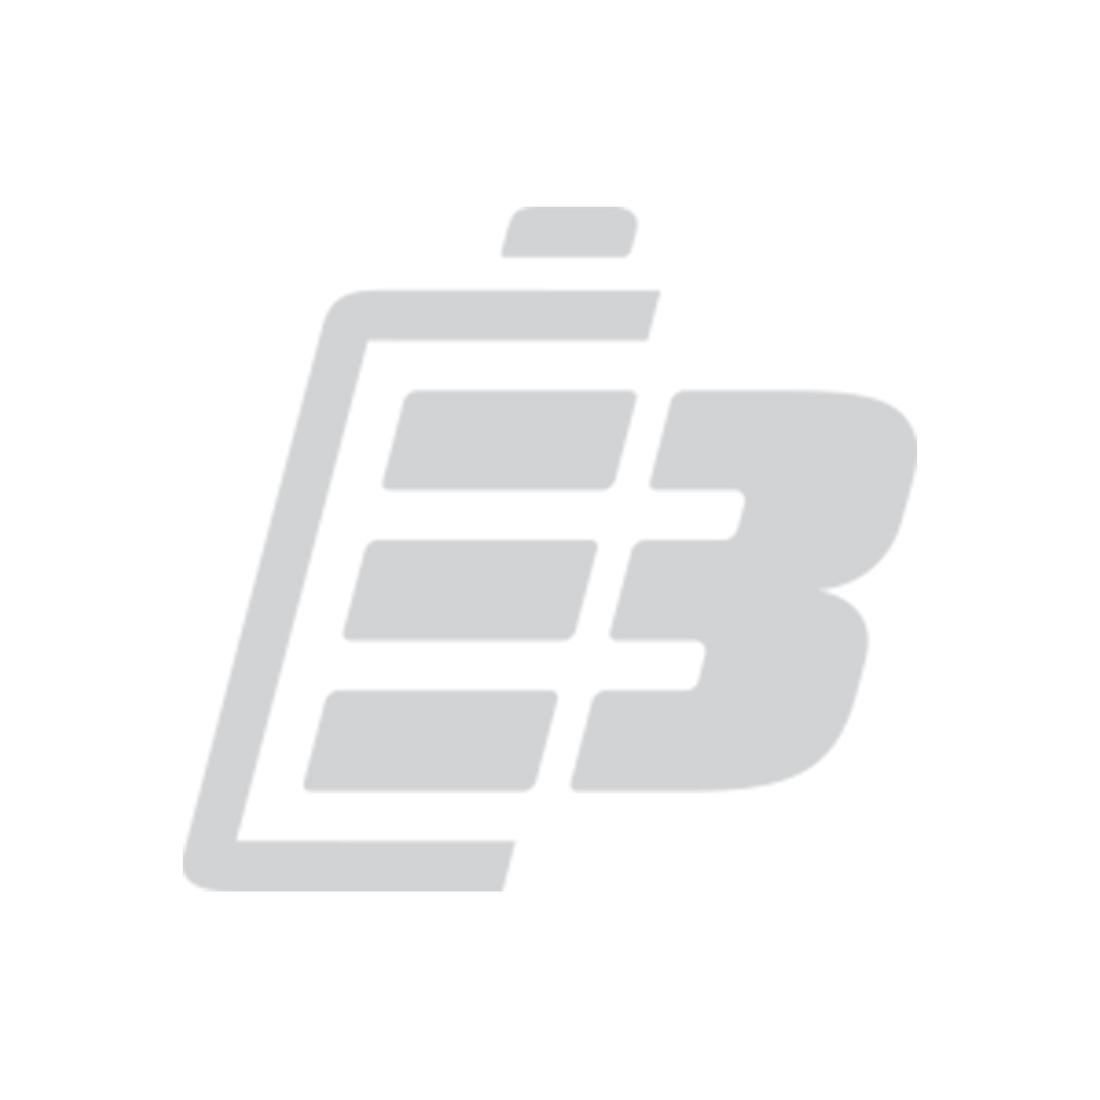 PDA battery Fujitsu Loox 700_1